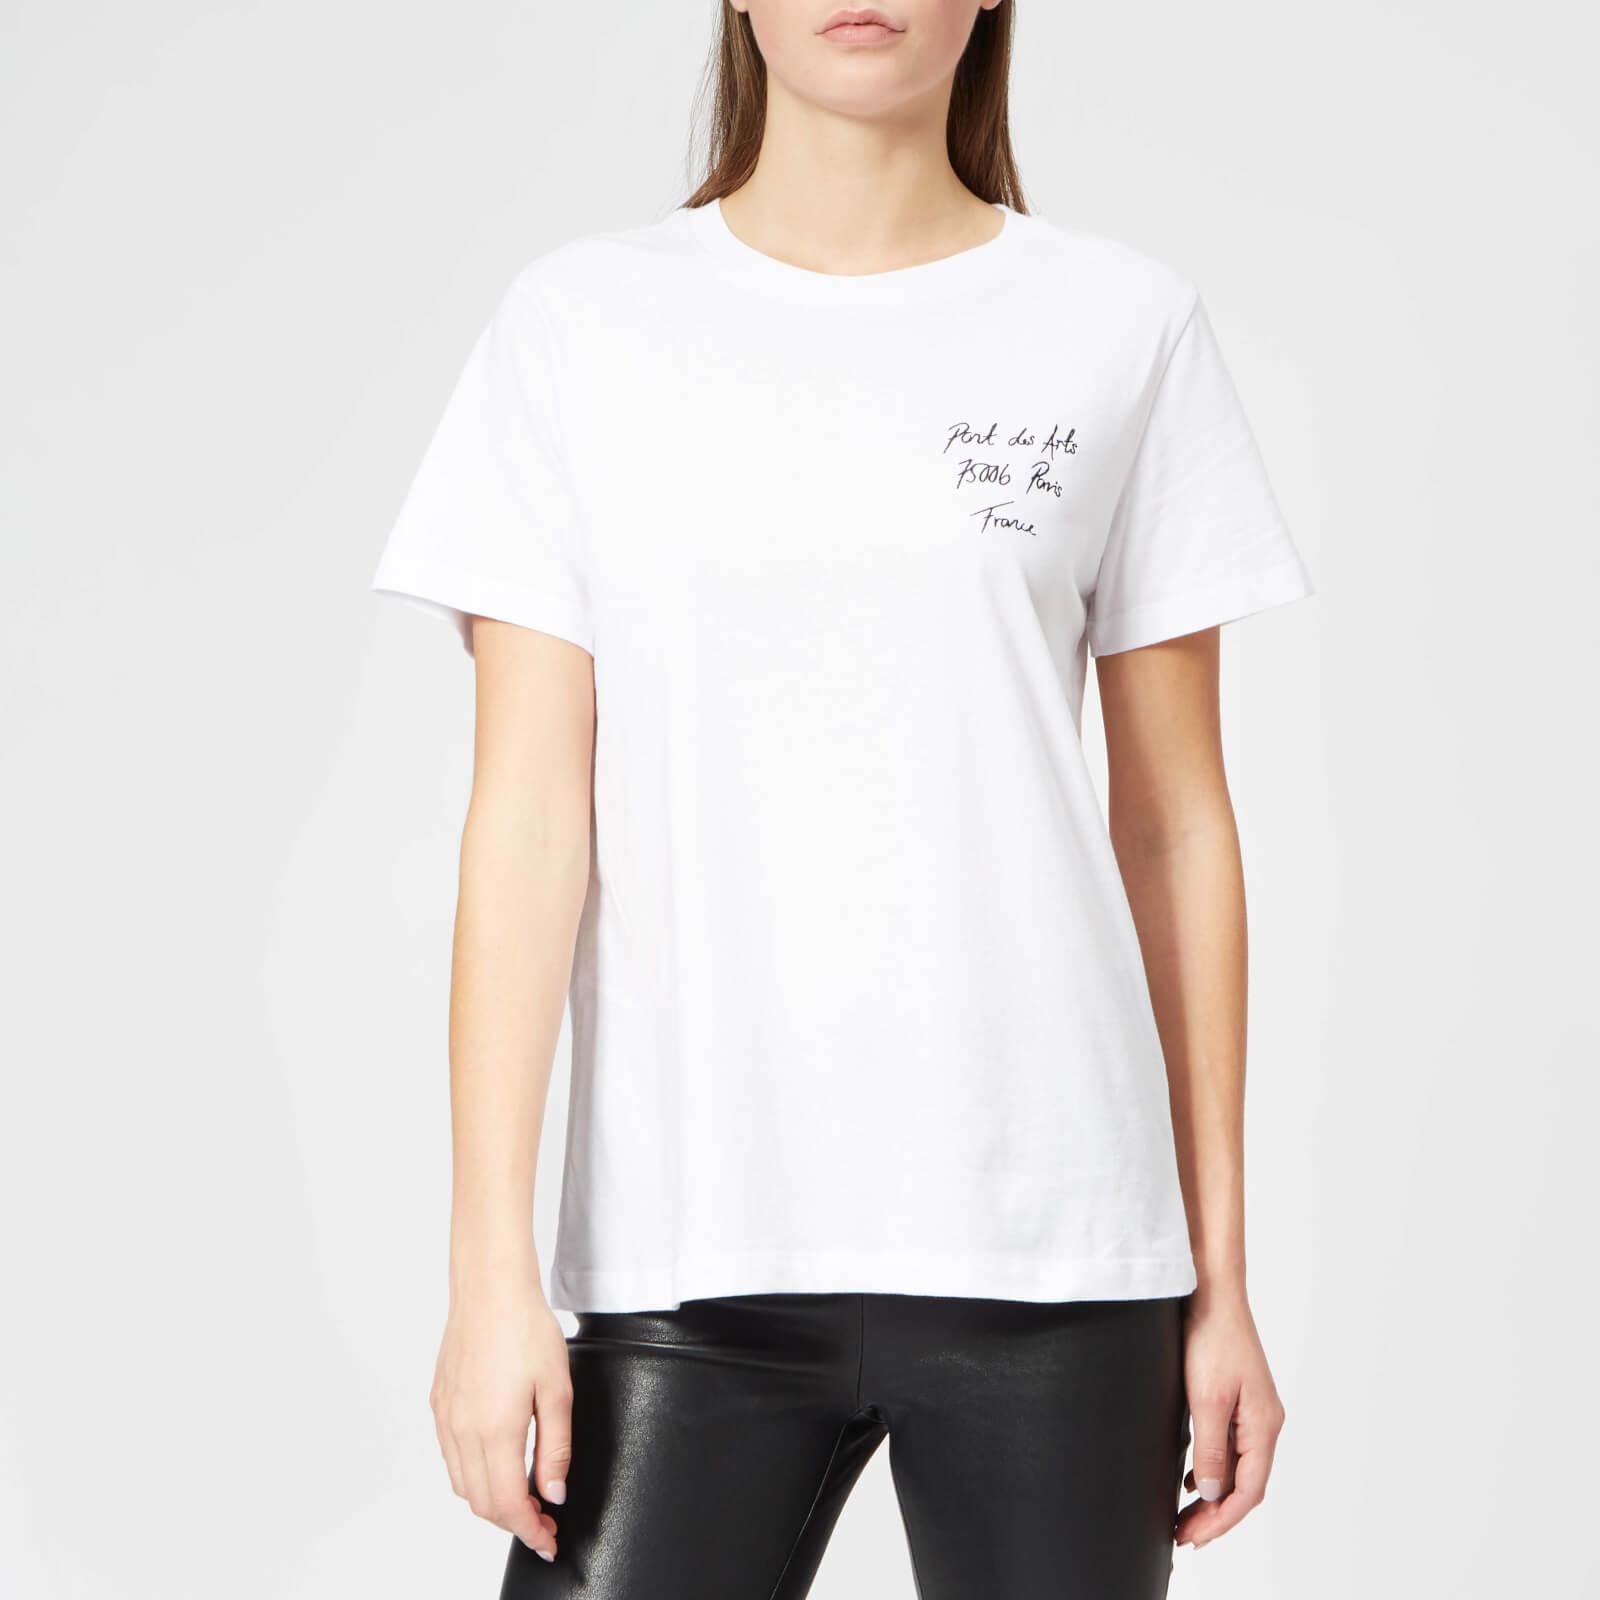 Gestuz Women's Arts T-Shirt - White - S - White